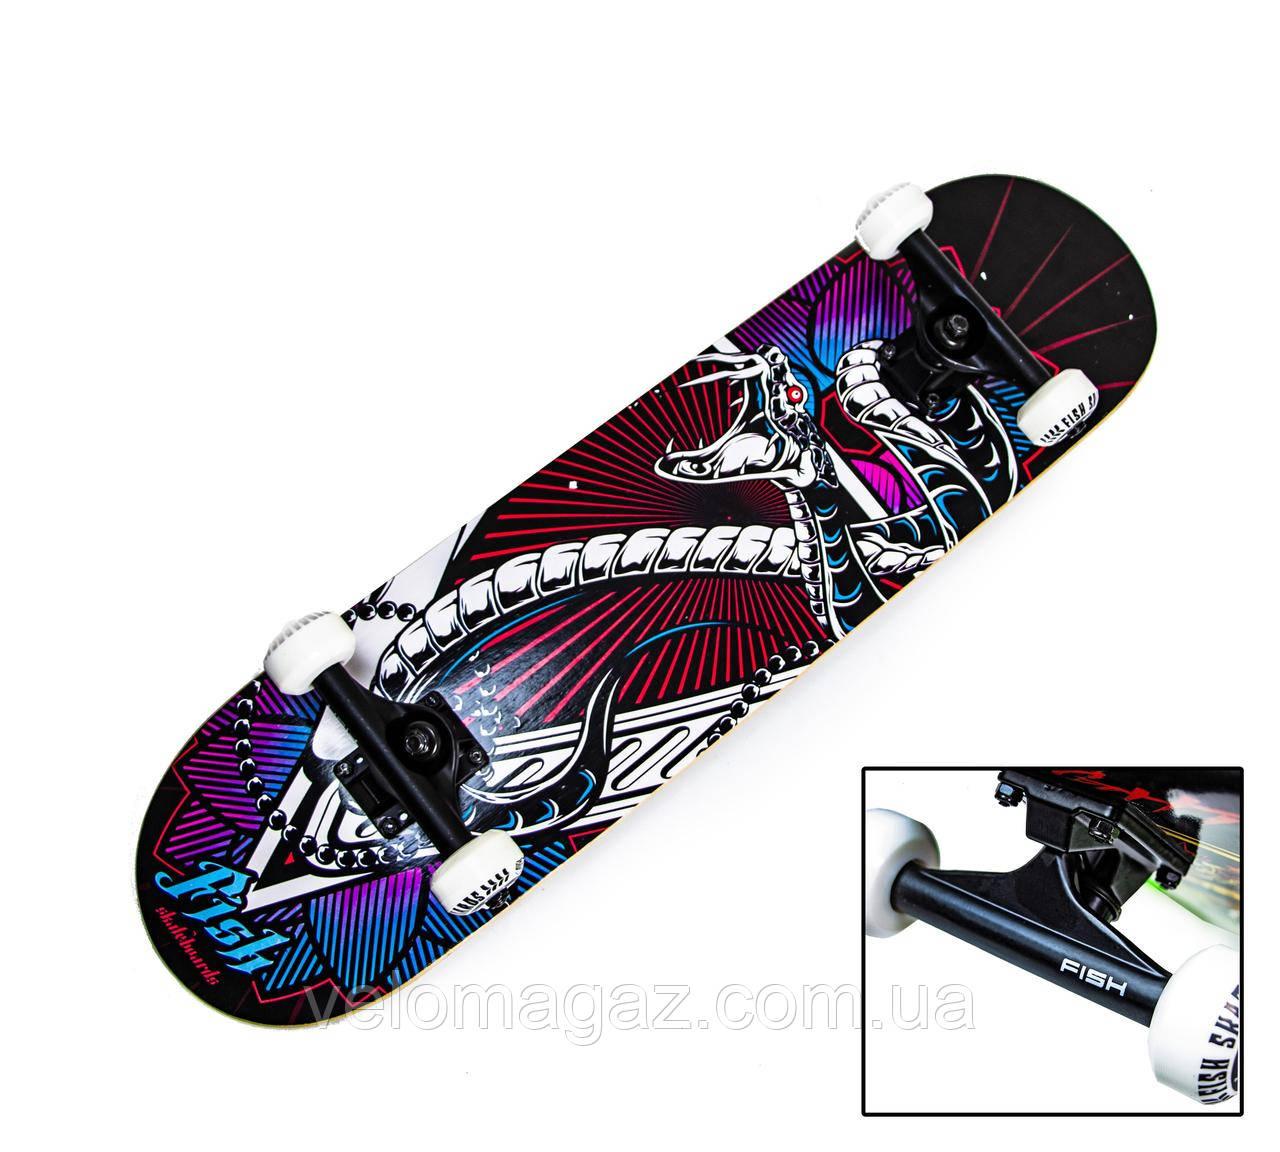 Деревянный скейтборд SNAKE, 79*20 см, клён